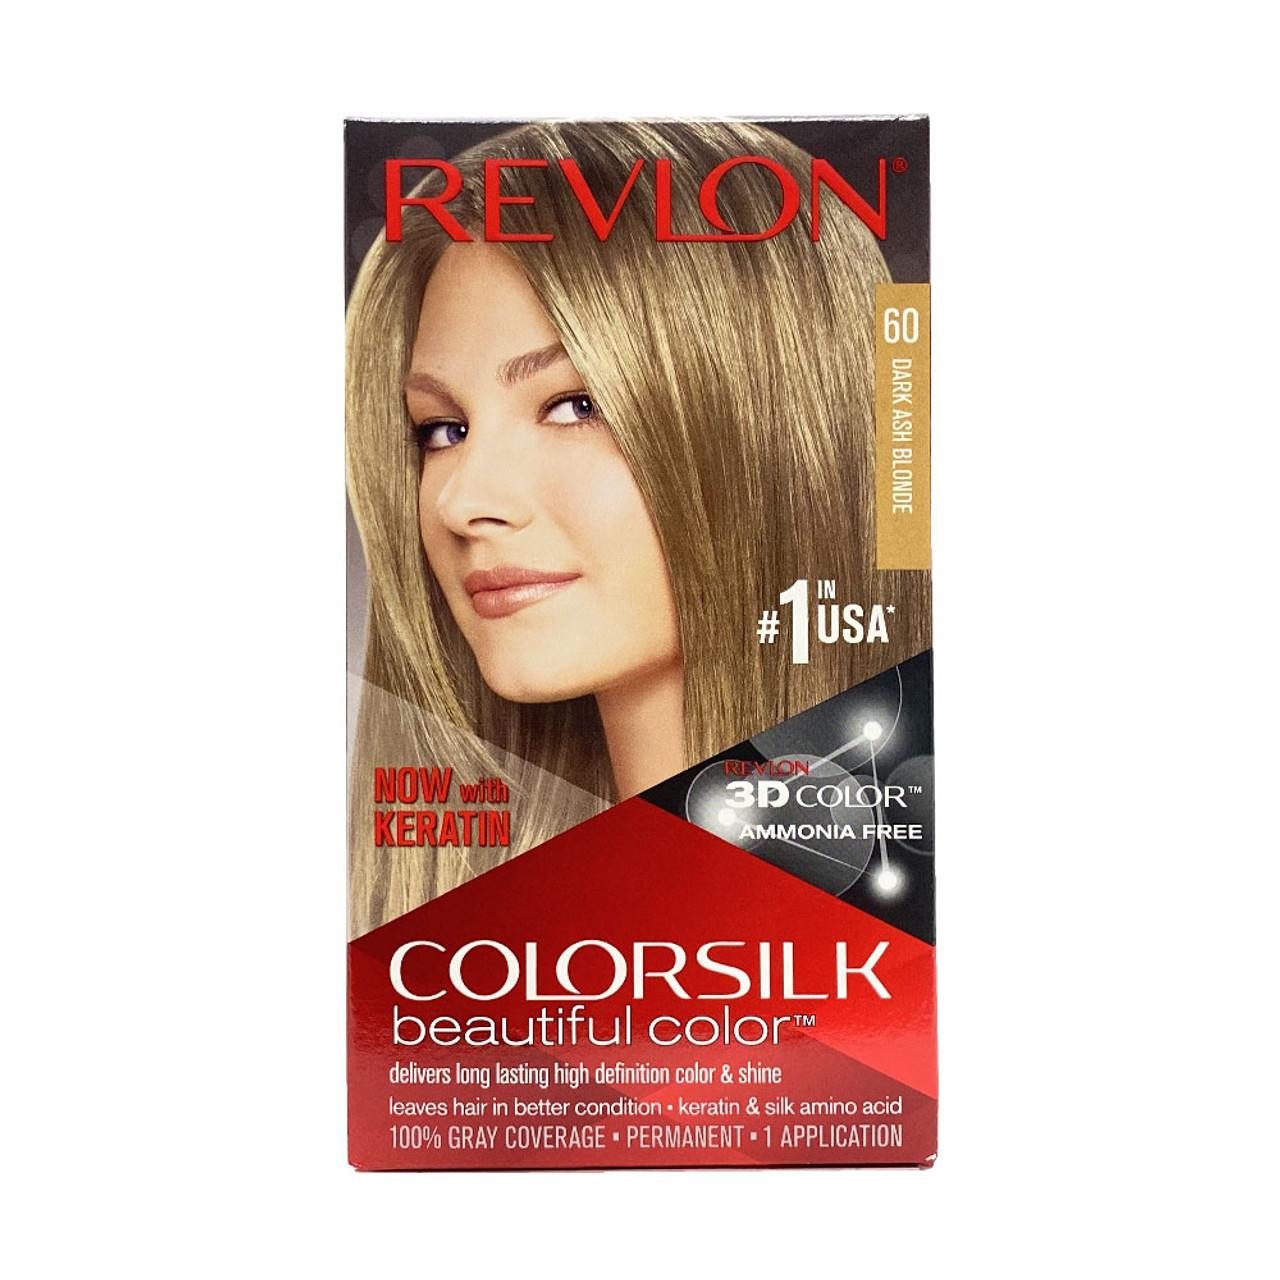 Revlon Colorsilk Dark Ash Blonde 18 Hair Color